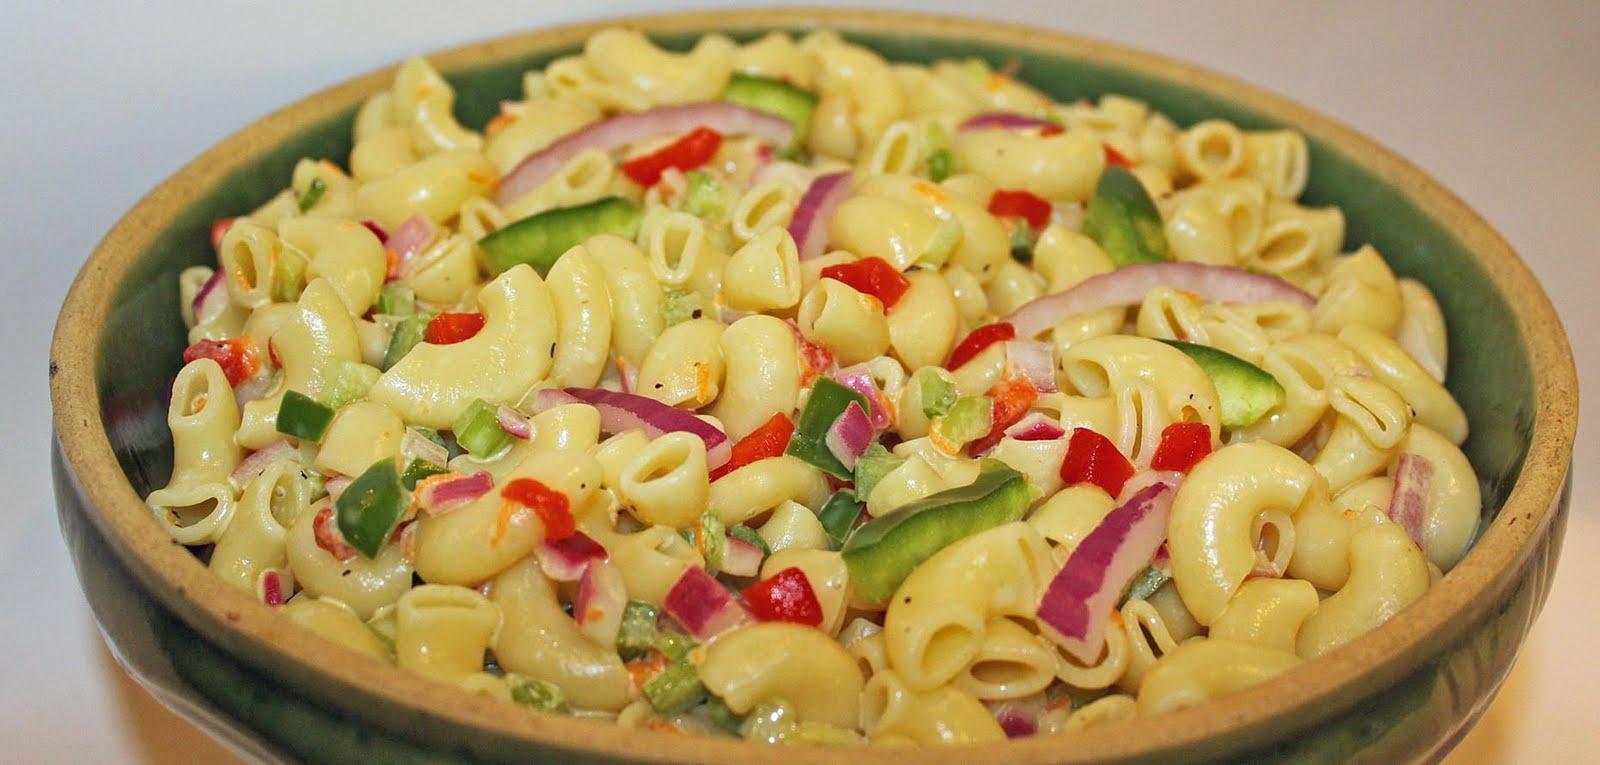 Southern Lagniappe: Classic Macaroni Salad Recipe